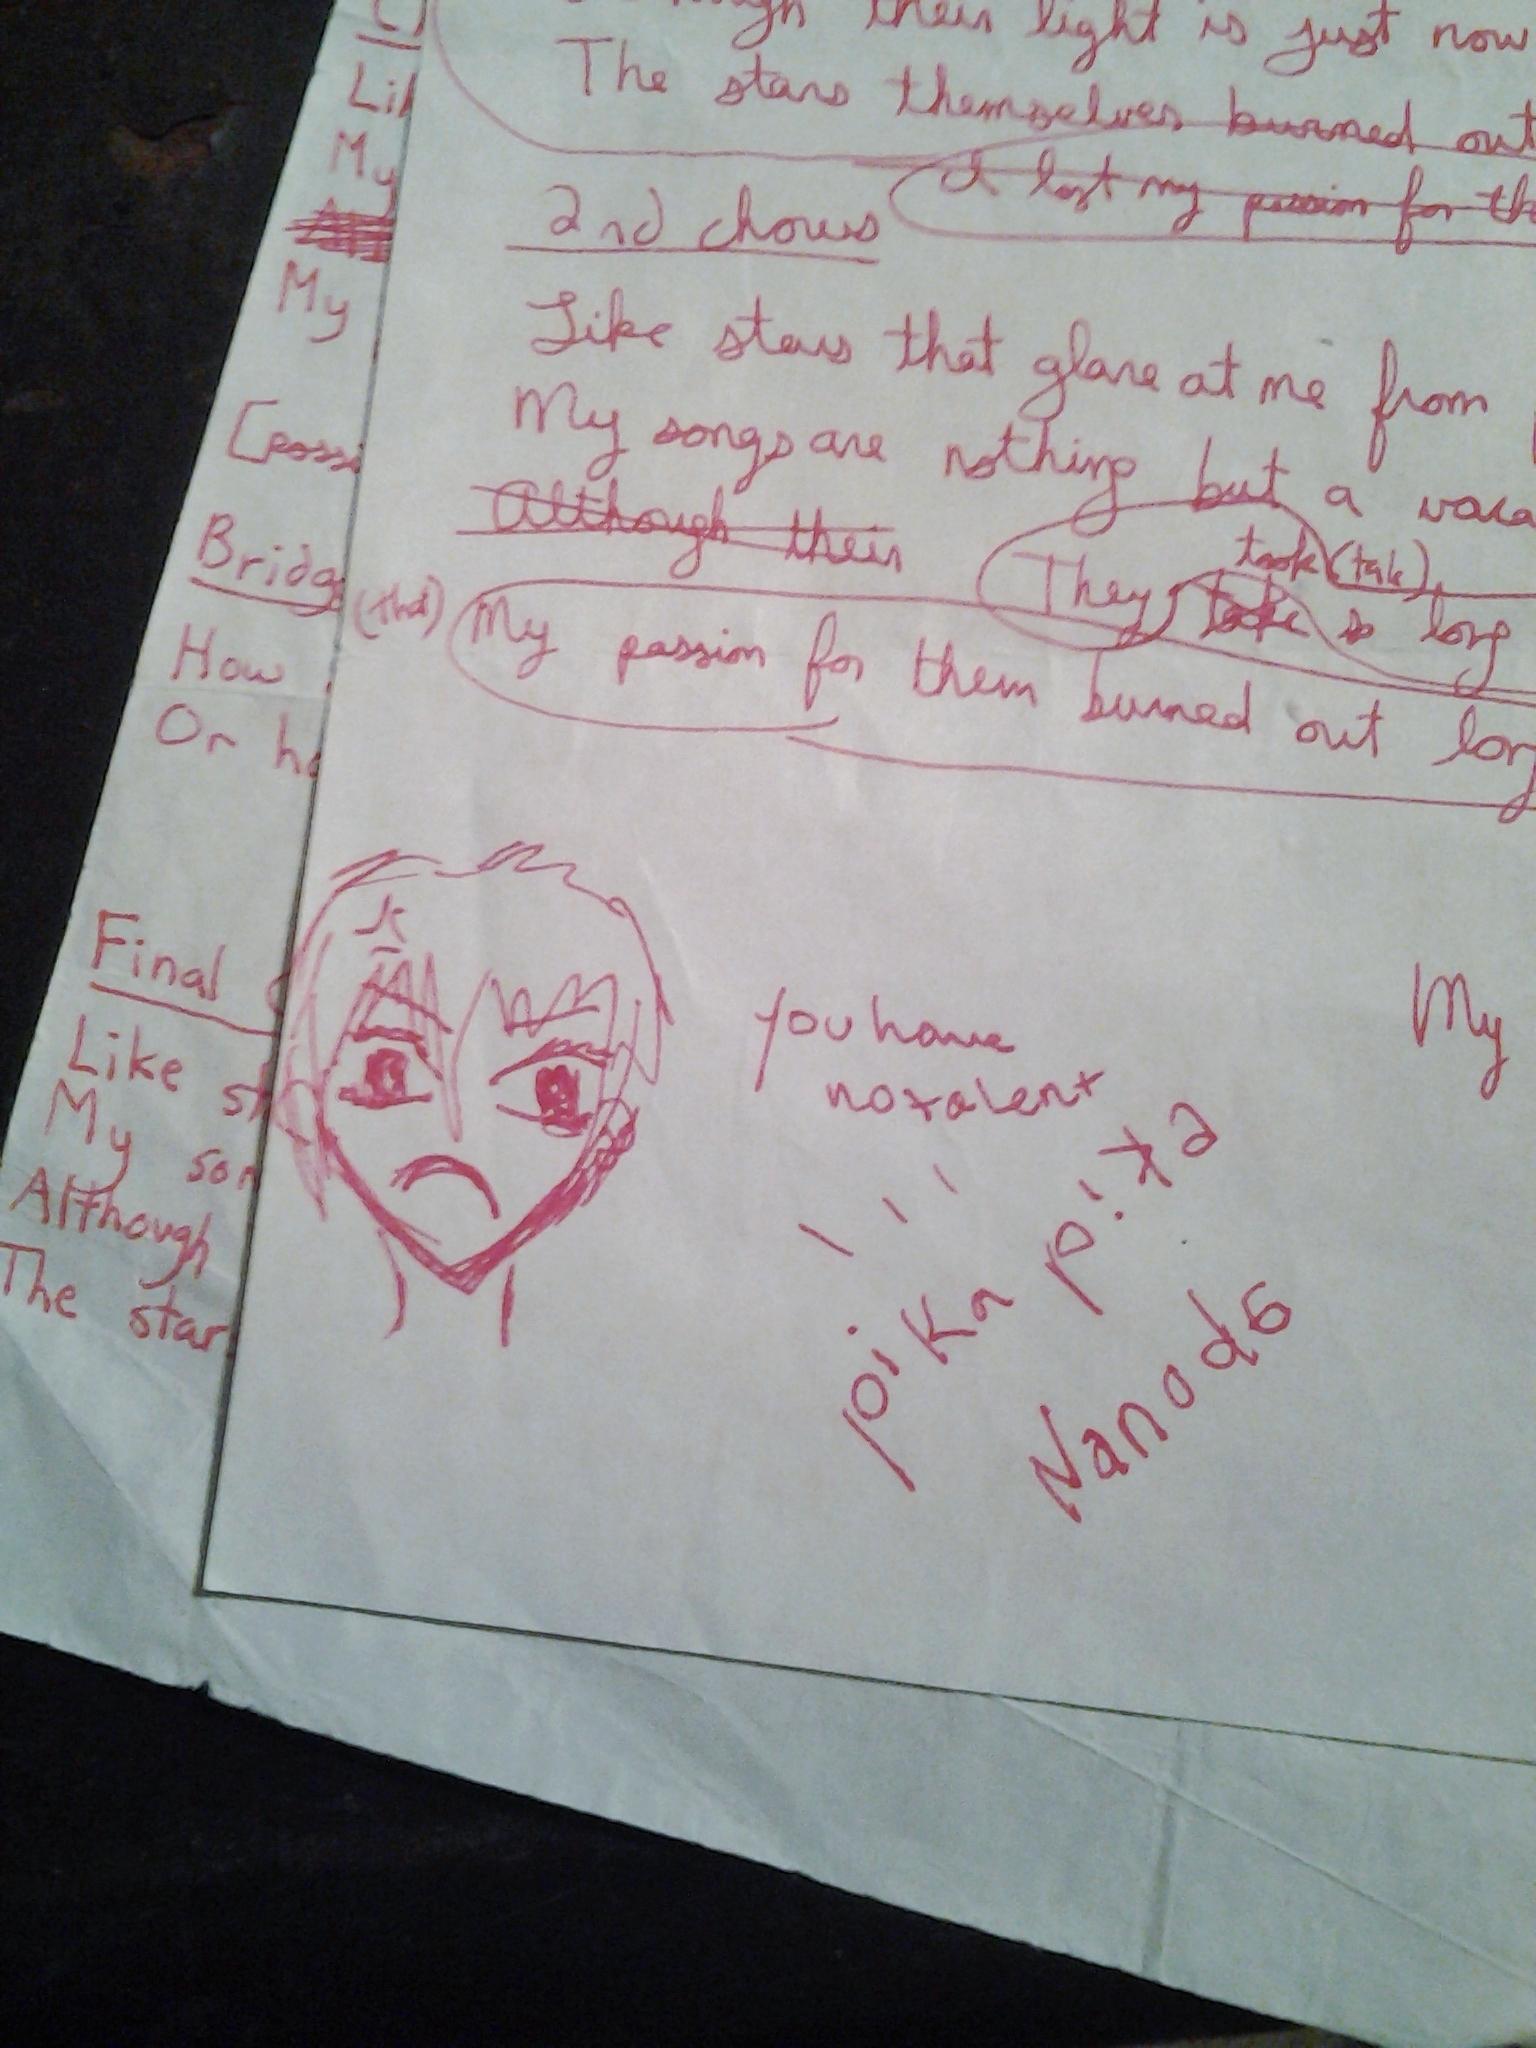 ZERO TALENT original lyrics sheets